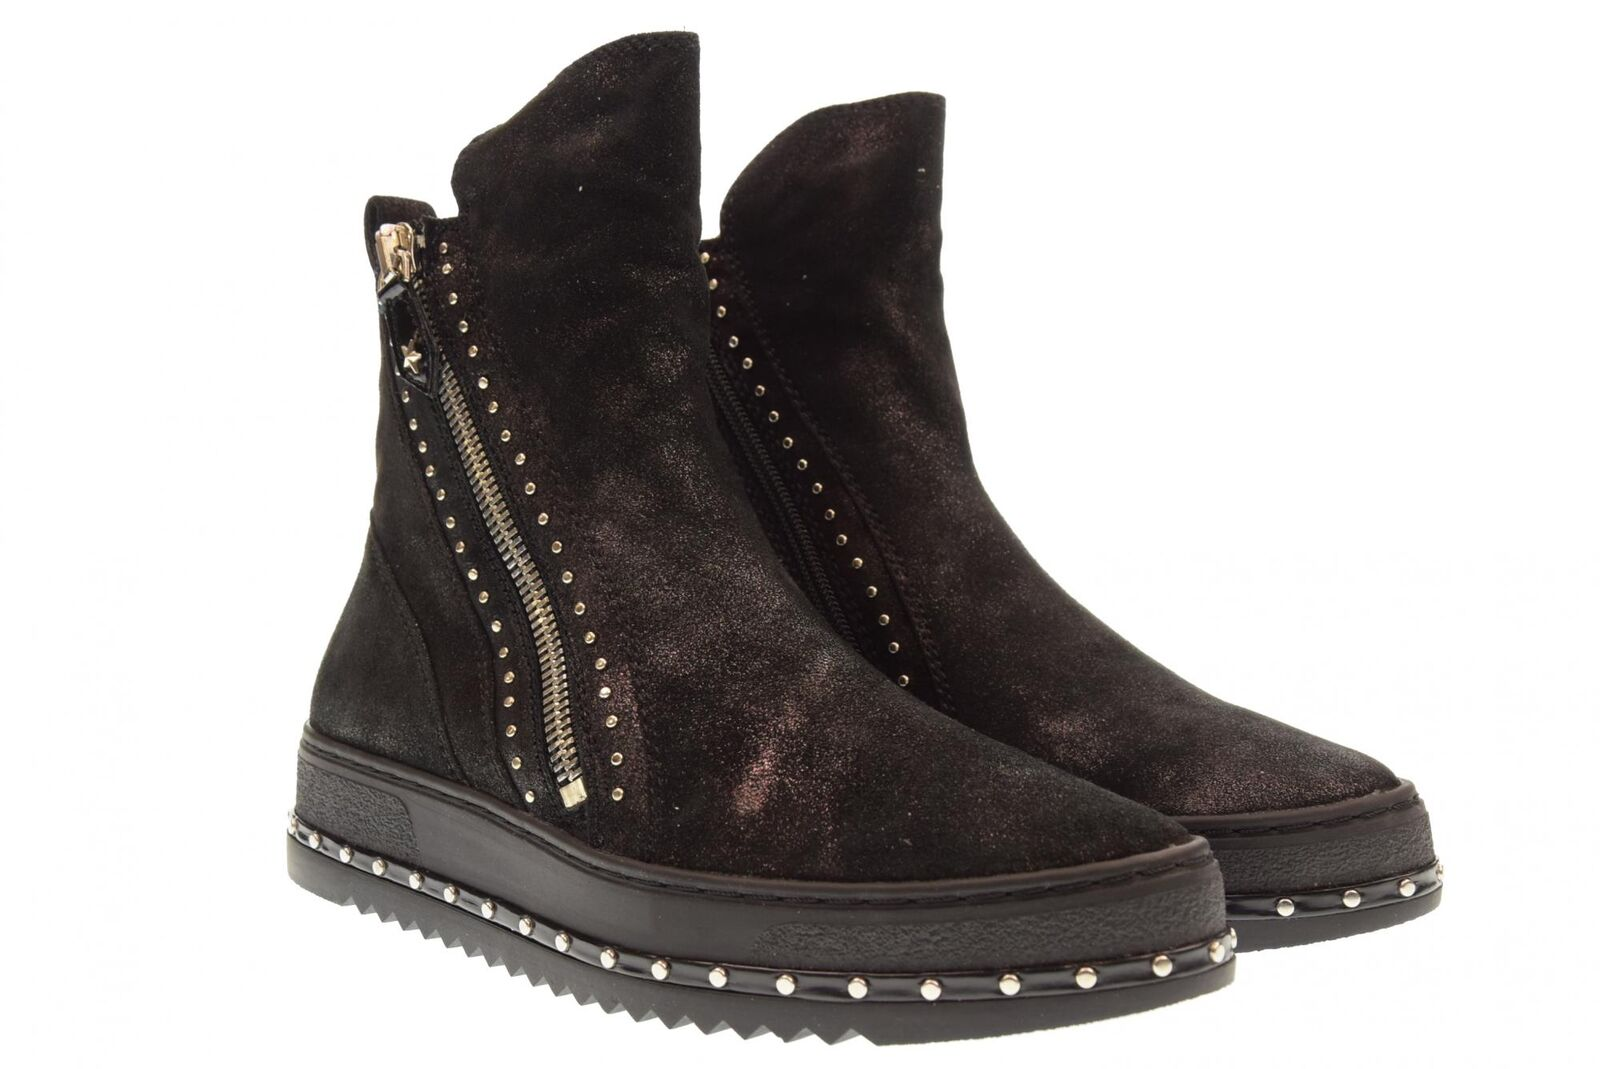 Altraofficina A18s Zapatos de mujer botines con con con plataforma T1804X.  en stock